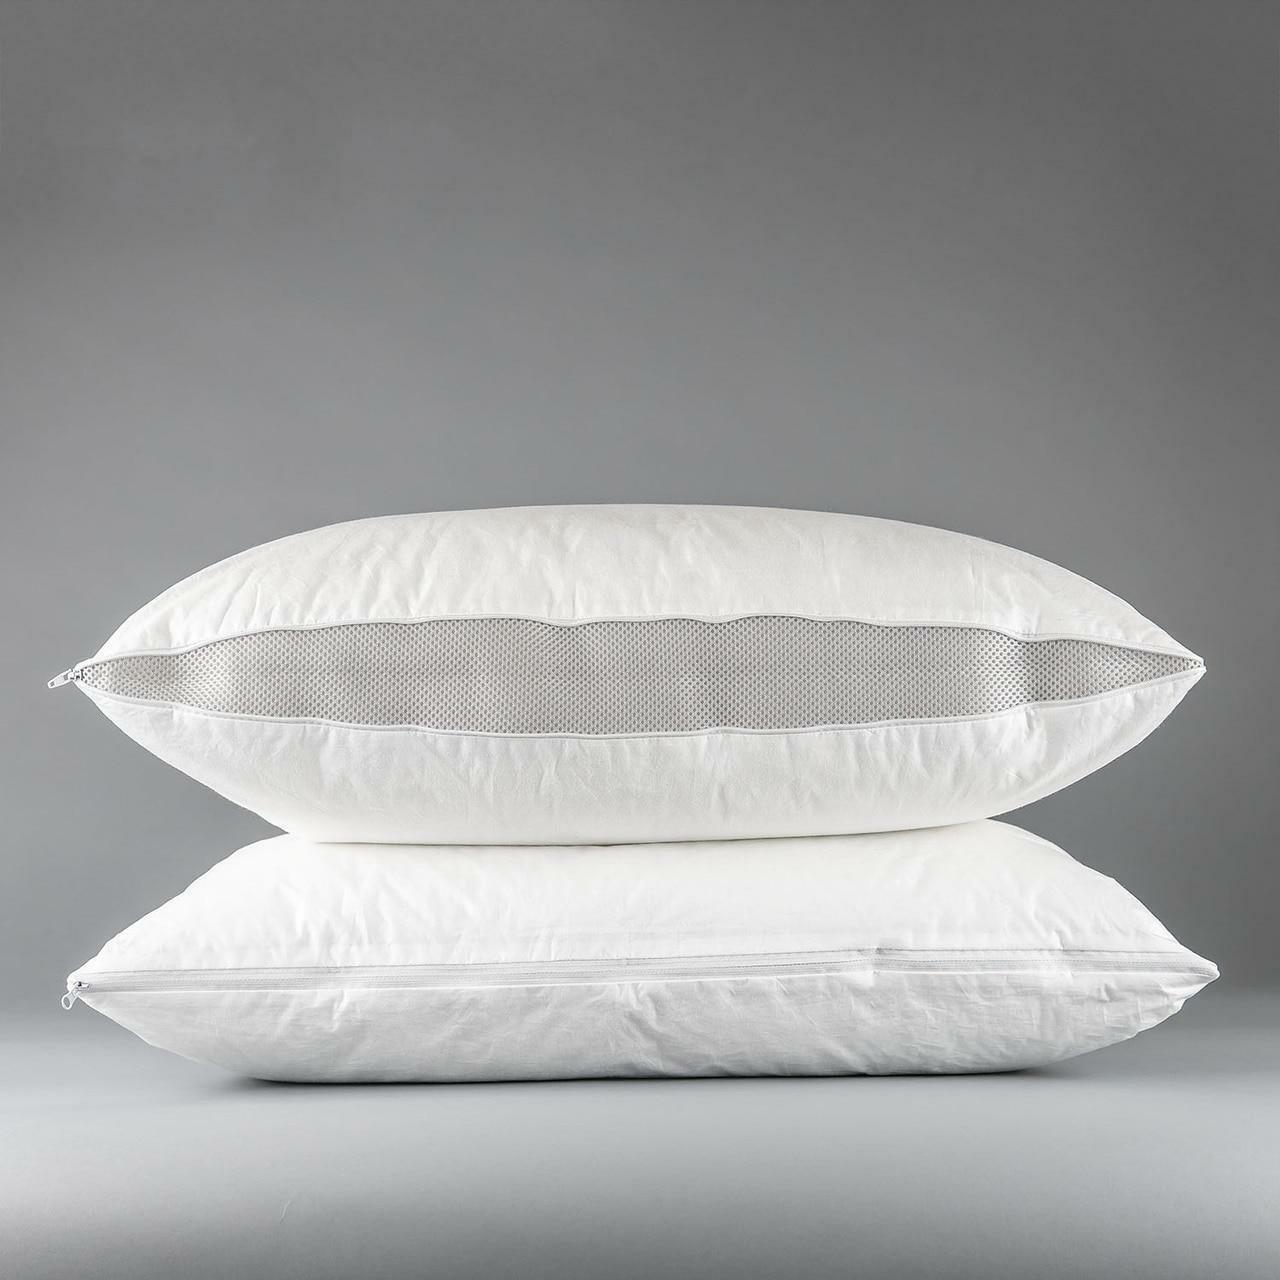 WestPoint/Martex Martex Flex Pillow